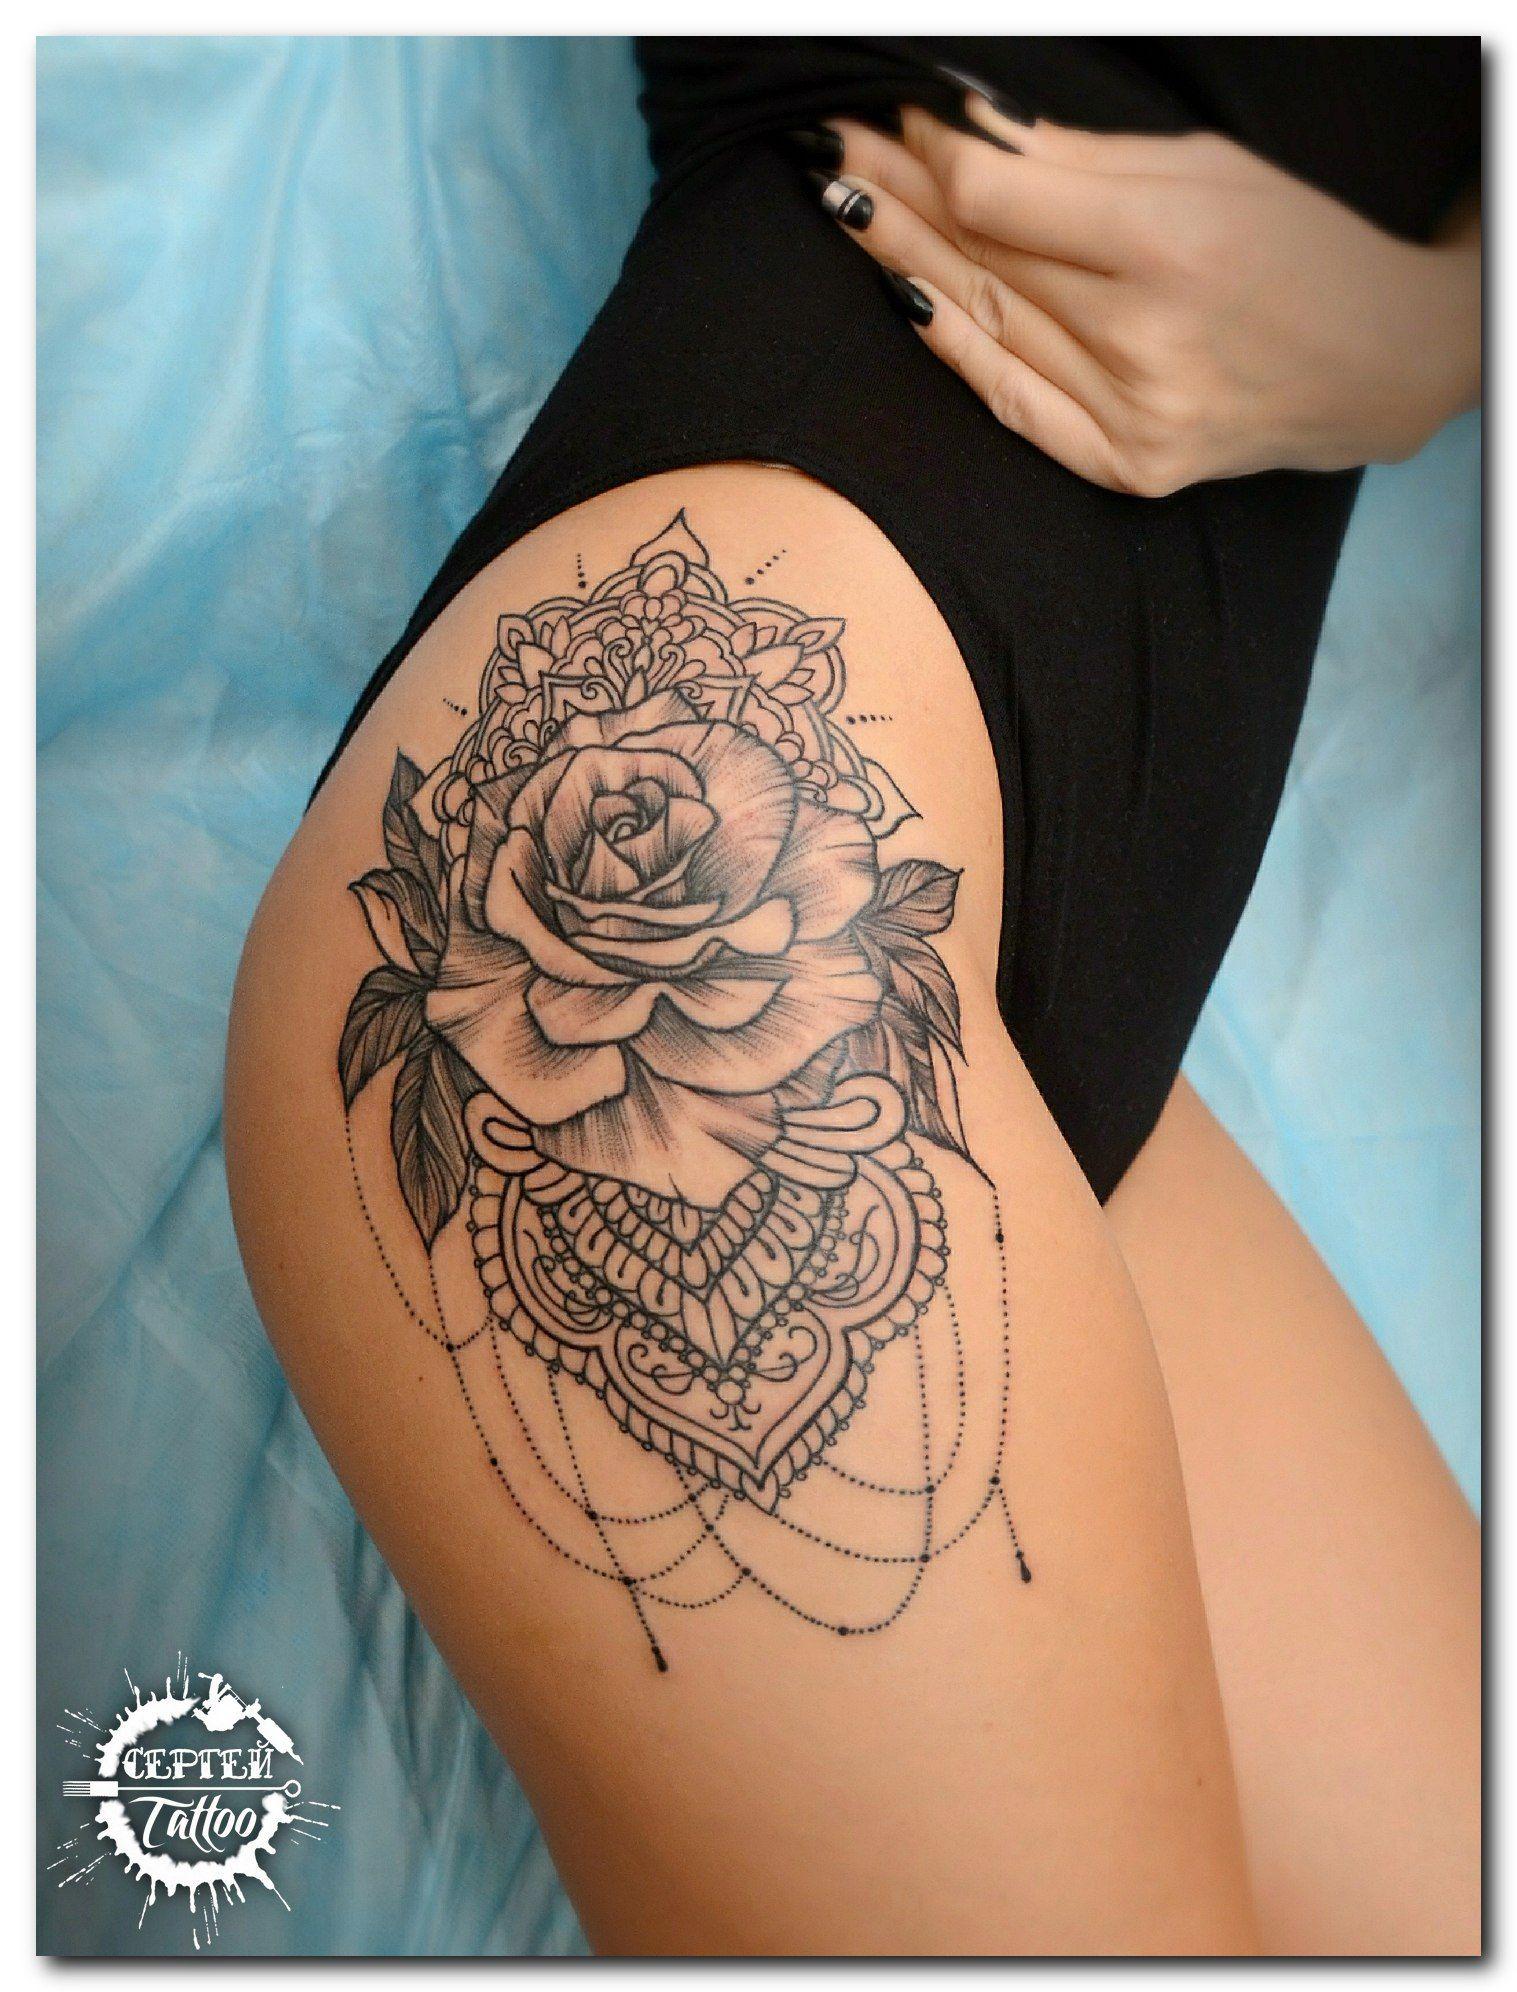 Tattoo Sergey Batalichev - tattoo's photo  In the style  Graphics, Female, Flowers, Ornamen (341492)